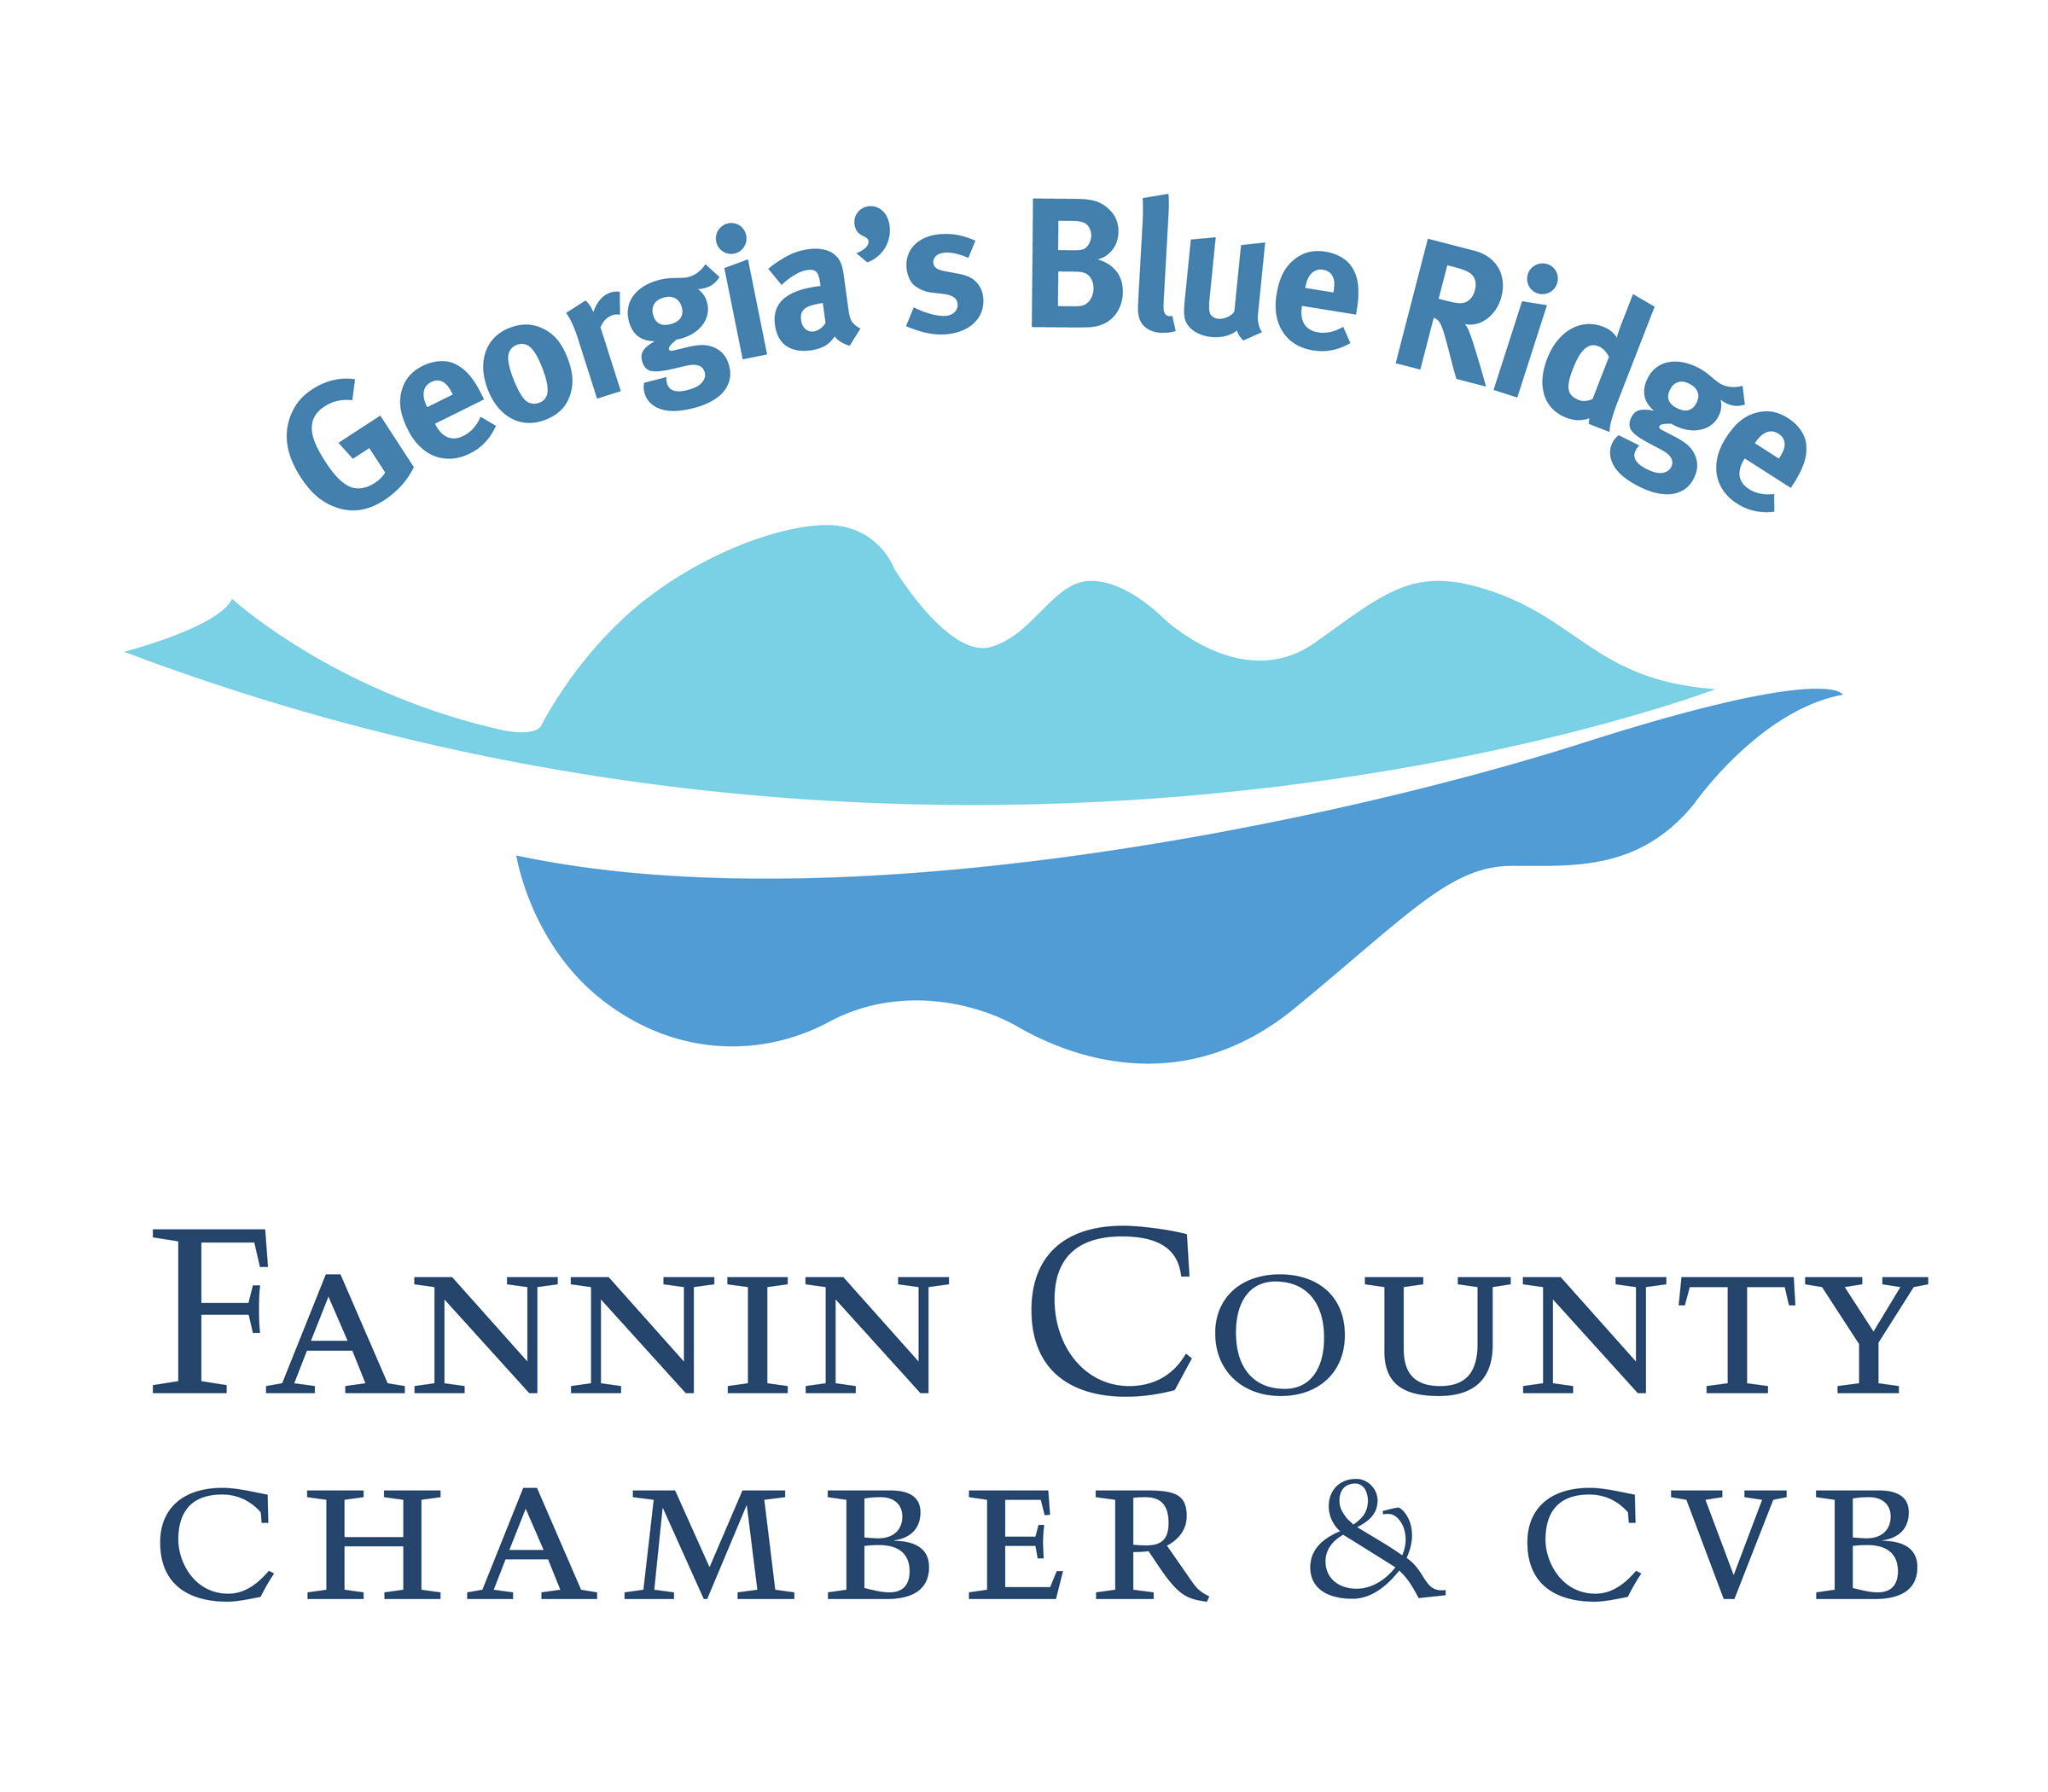 Fannin County Chamber & CVB